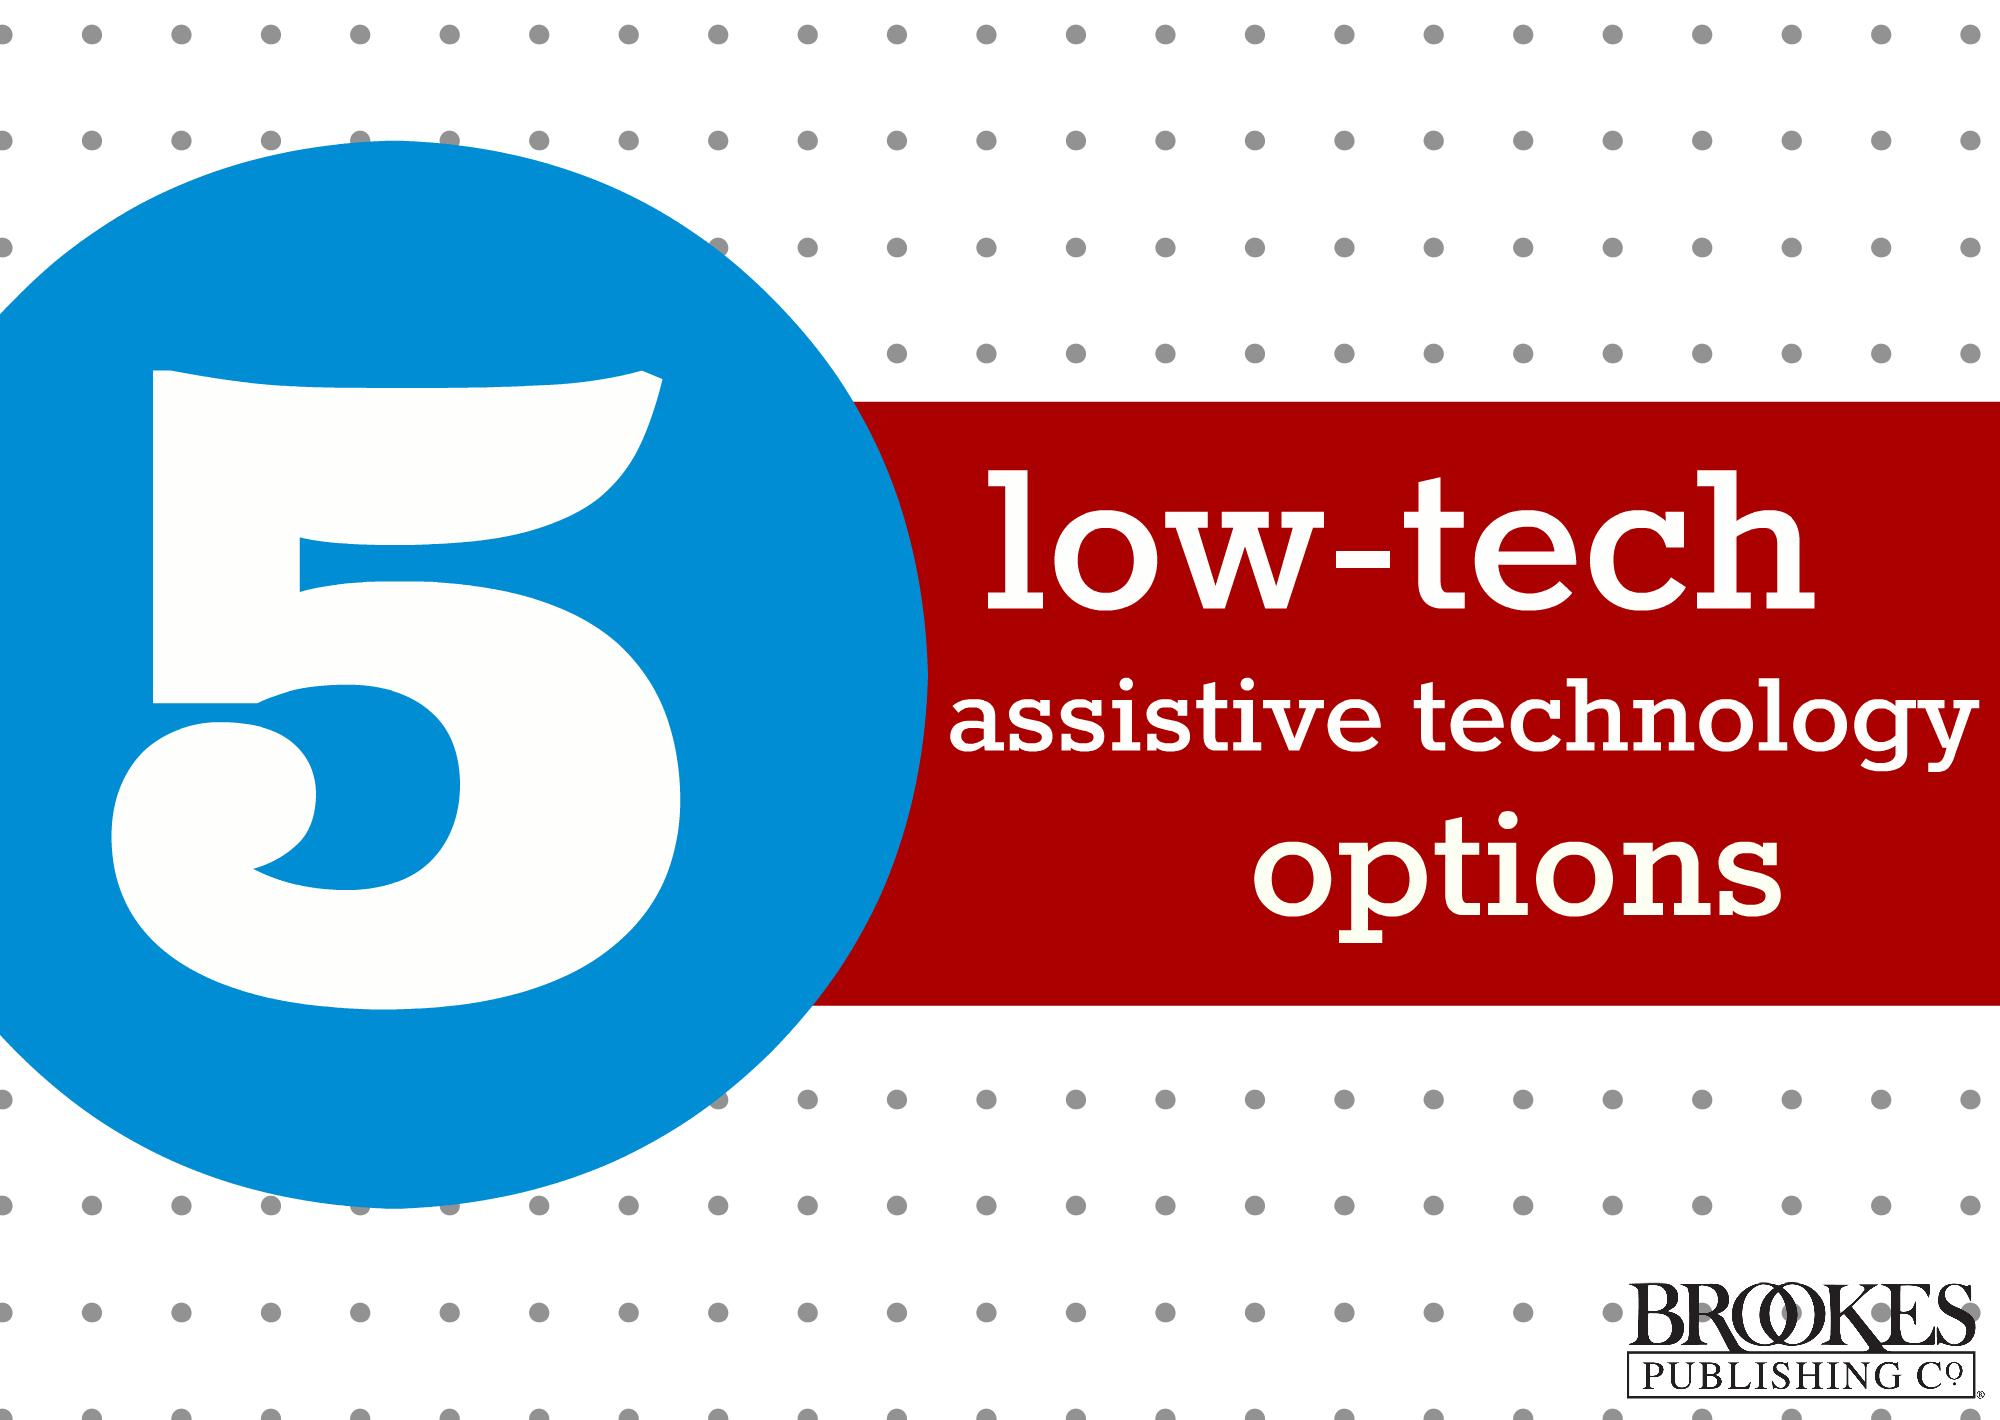 5 low-tech assistive technology options